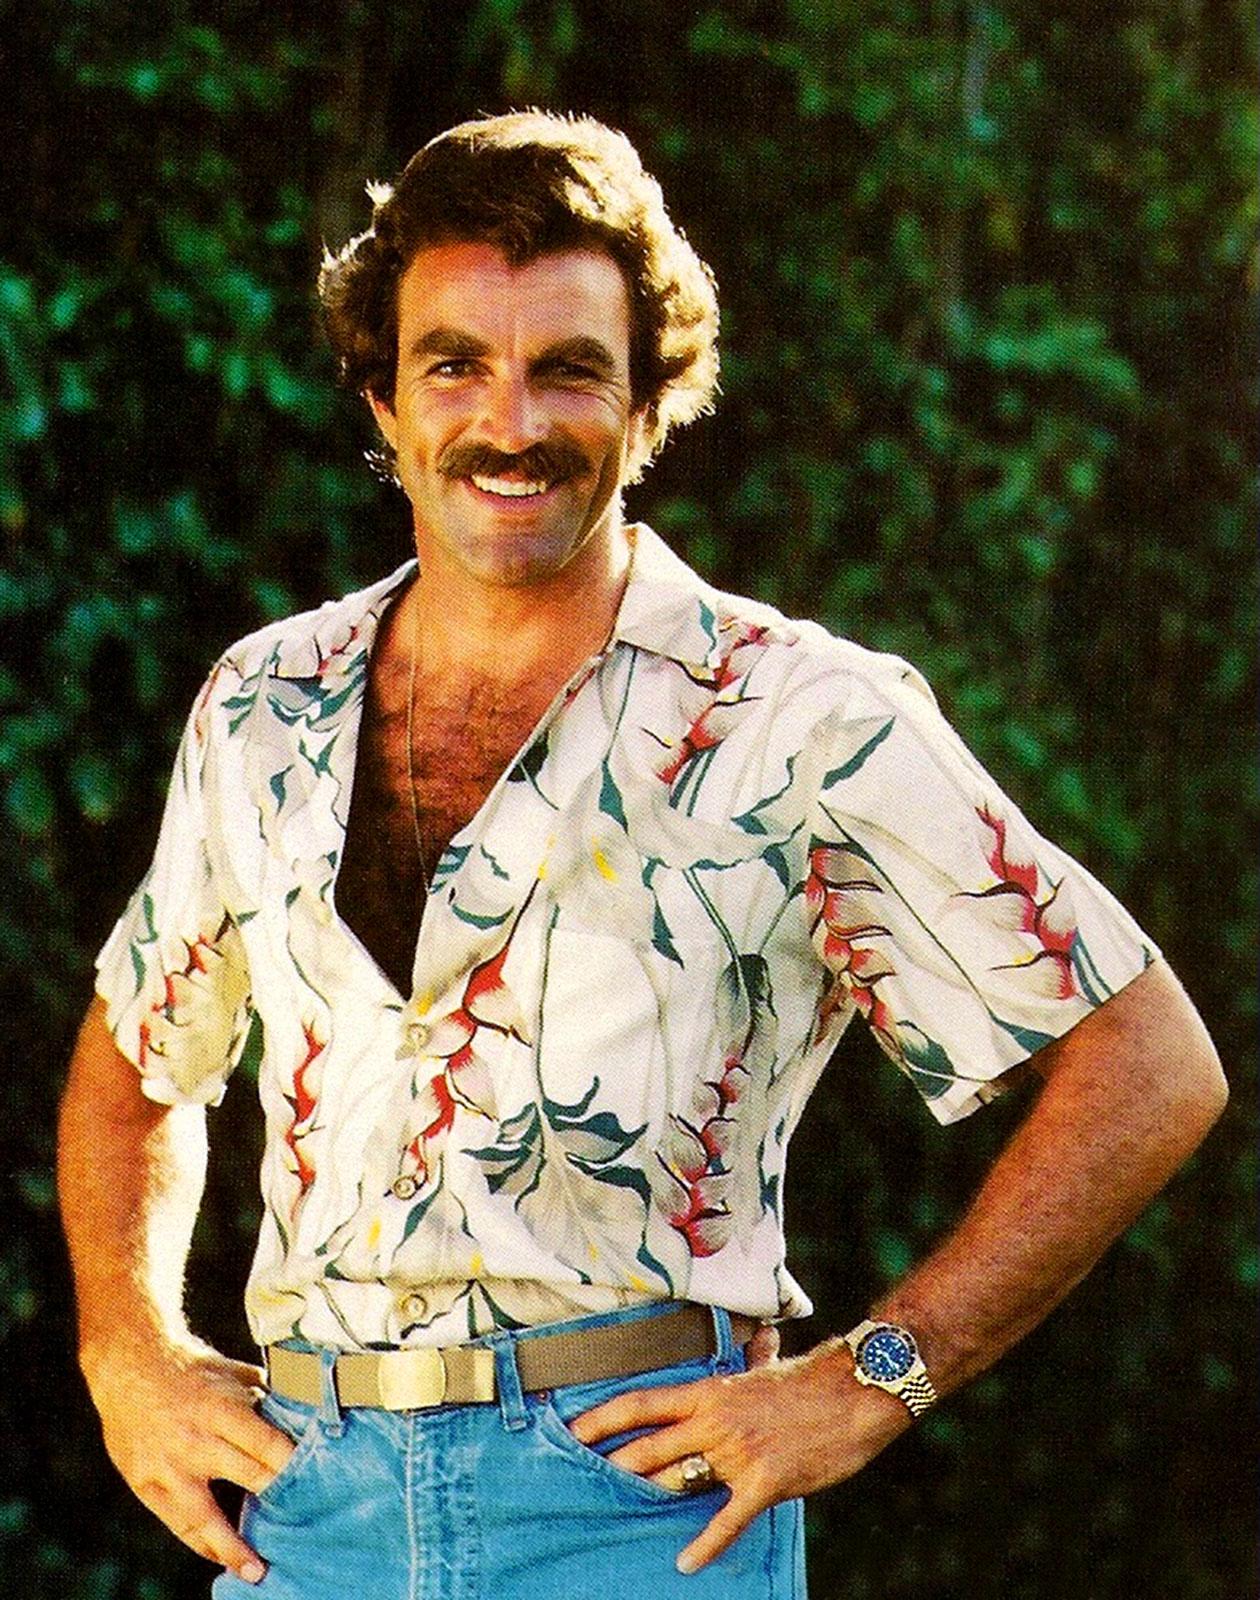 rolex coolness tom selleck still prefers pepsi after 3 decades martinlutherkingjr